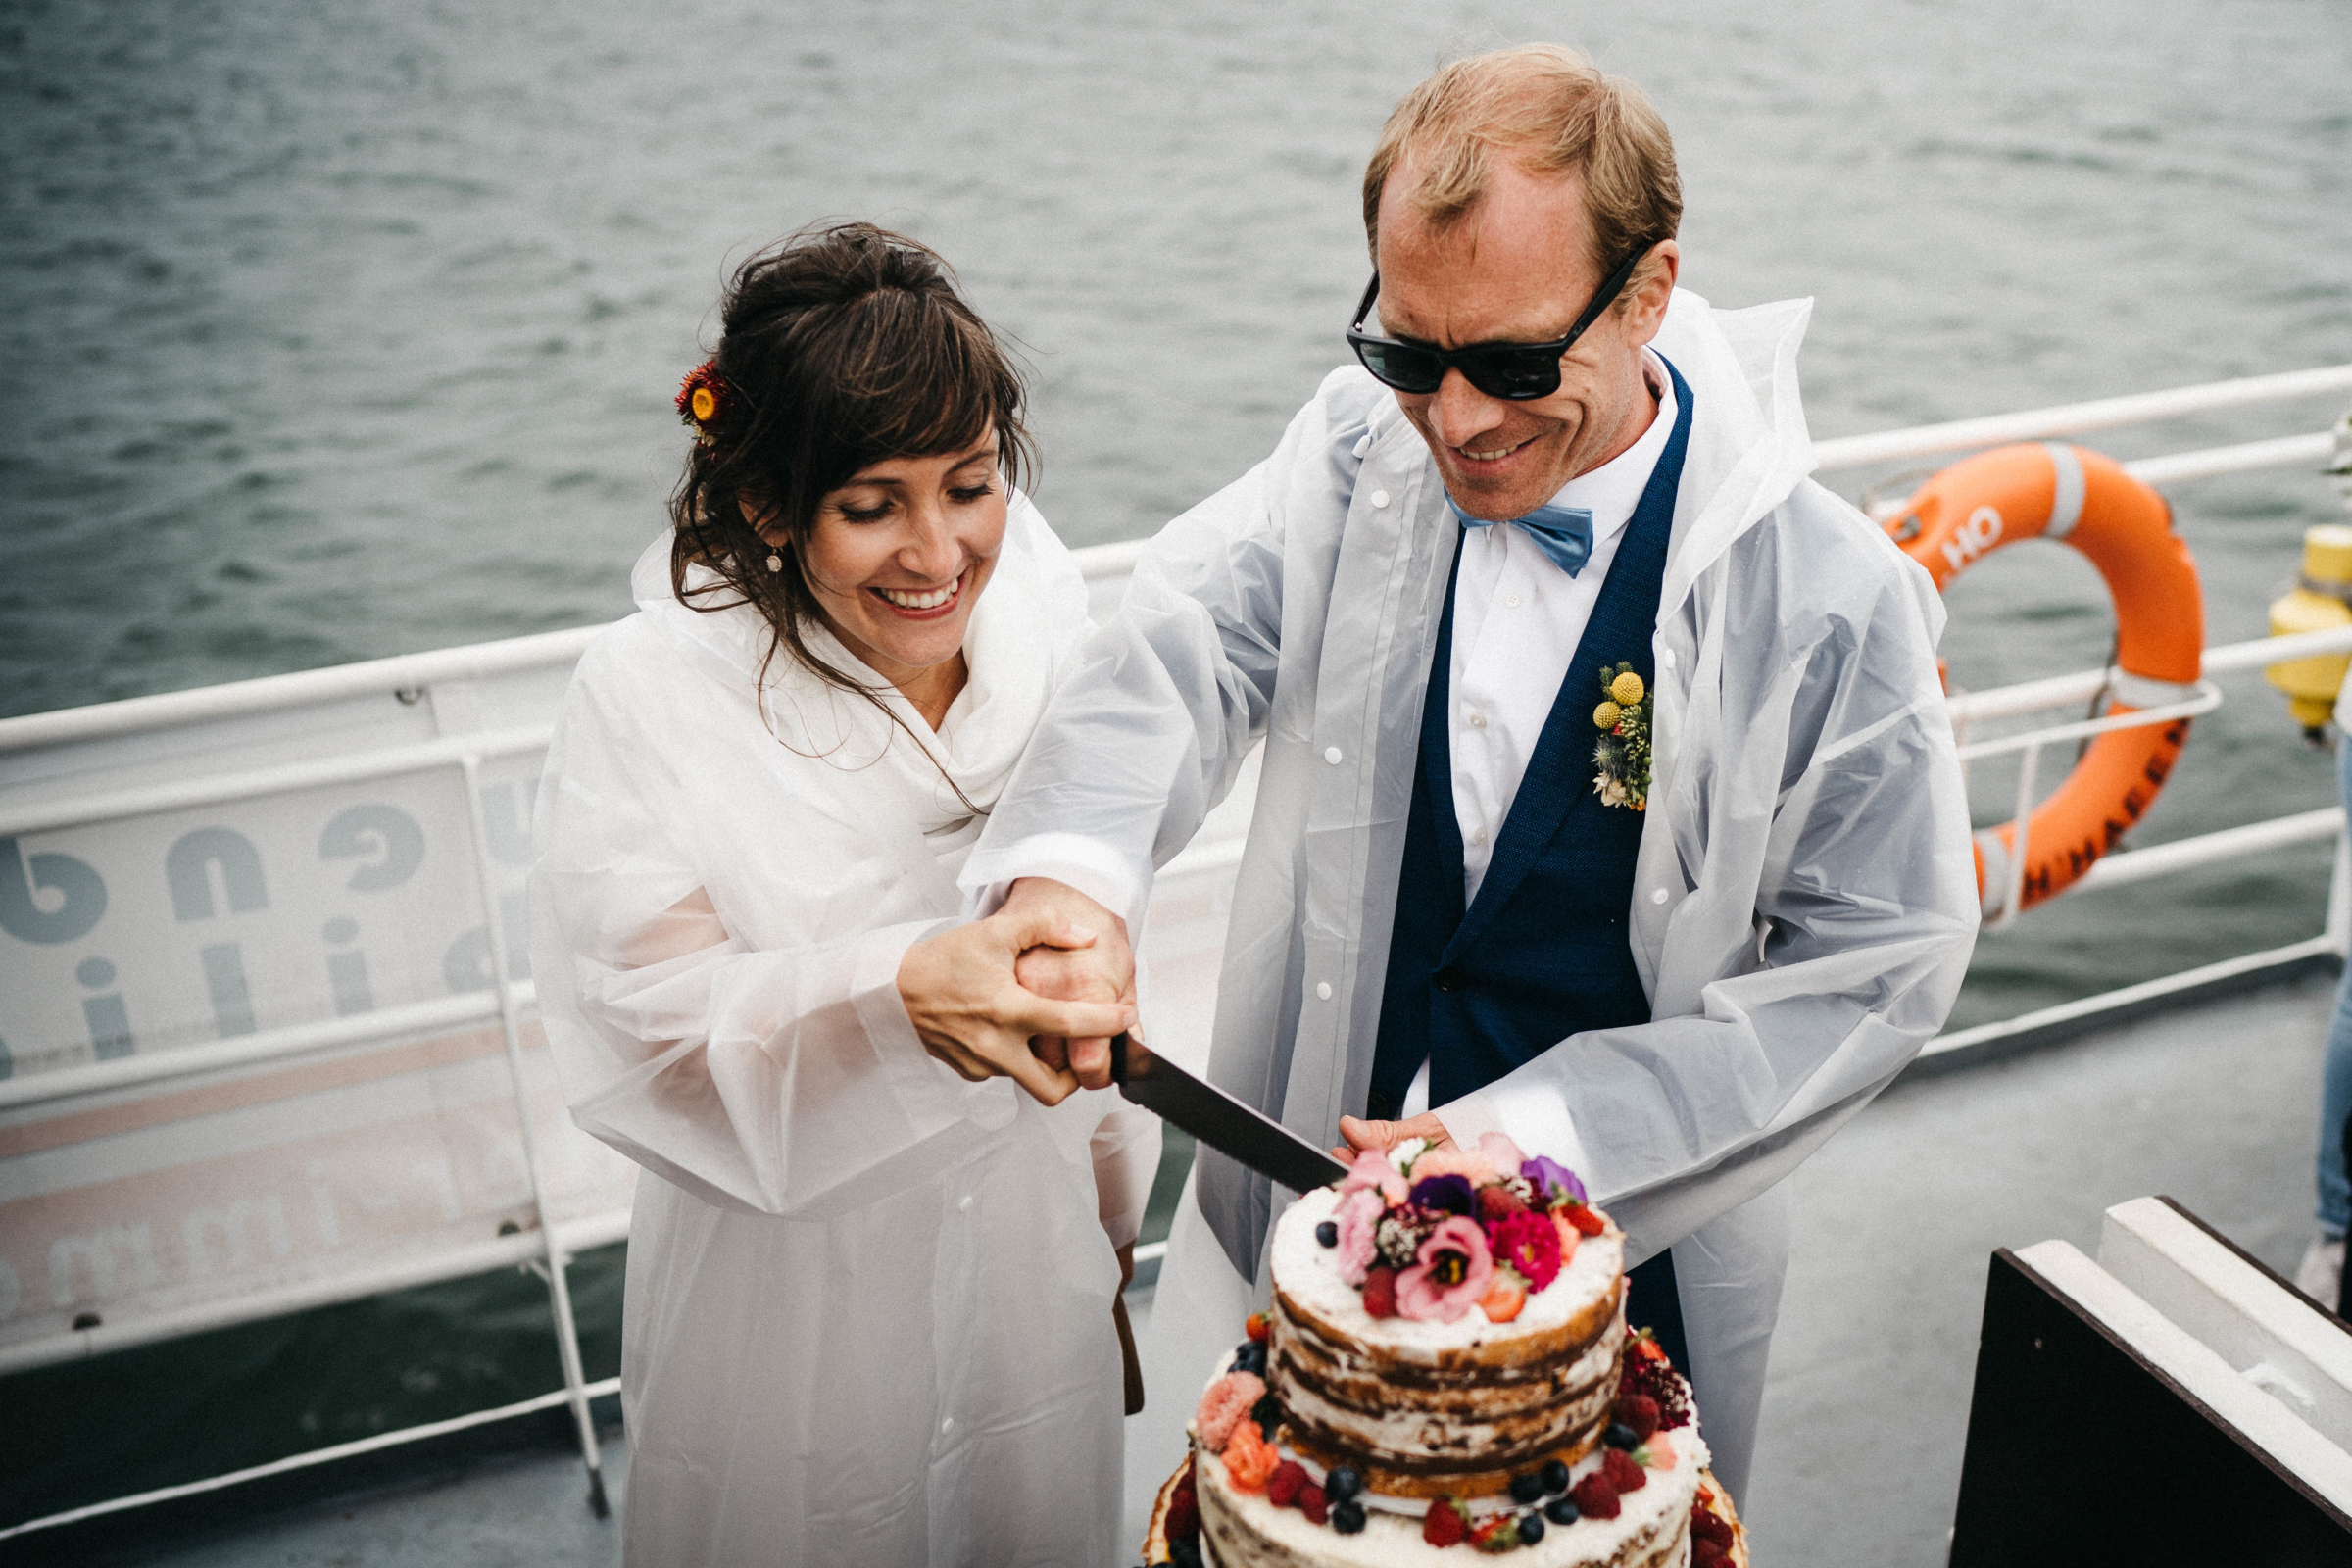 Tortenanschnitt_Regen_Hochzeit